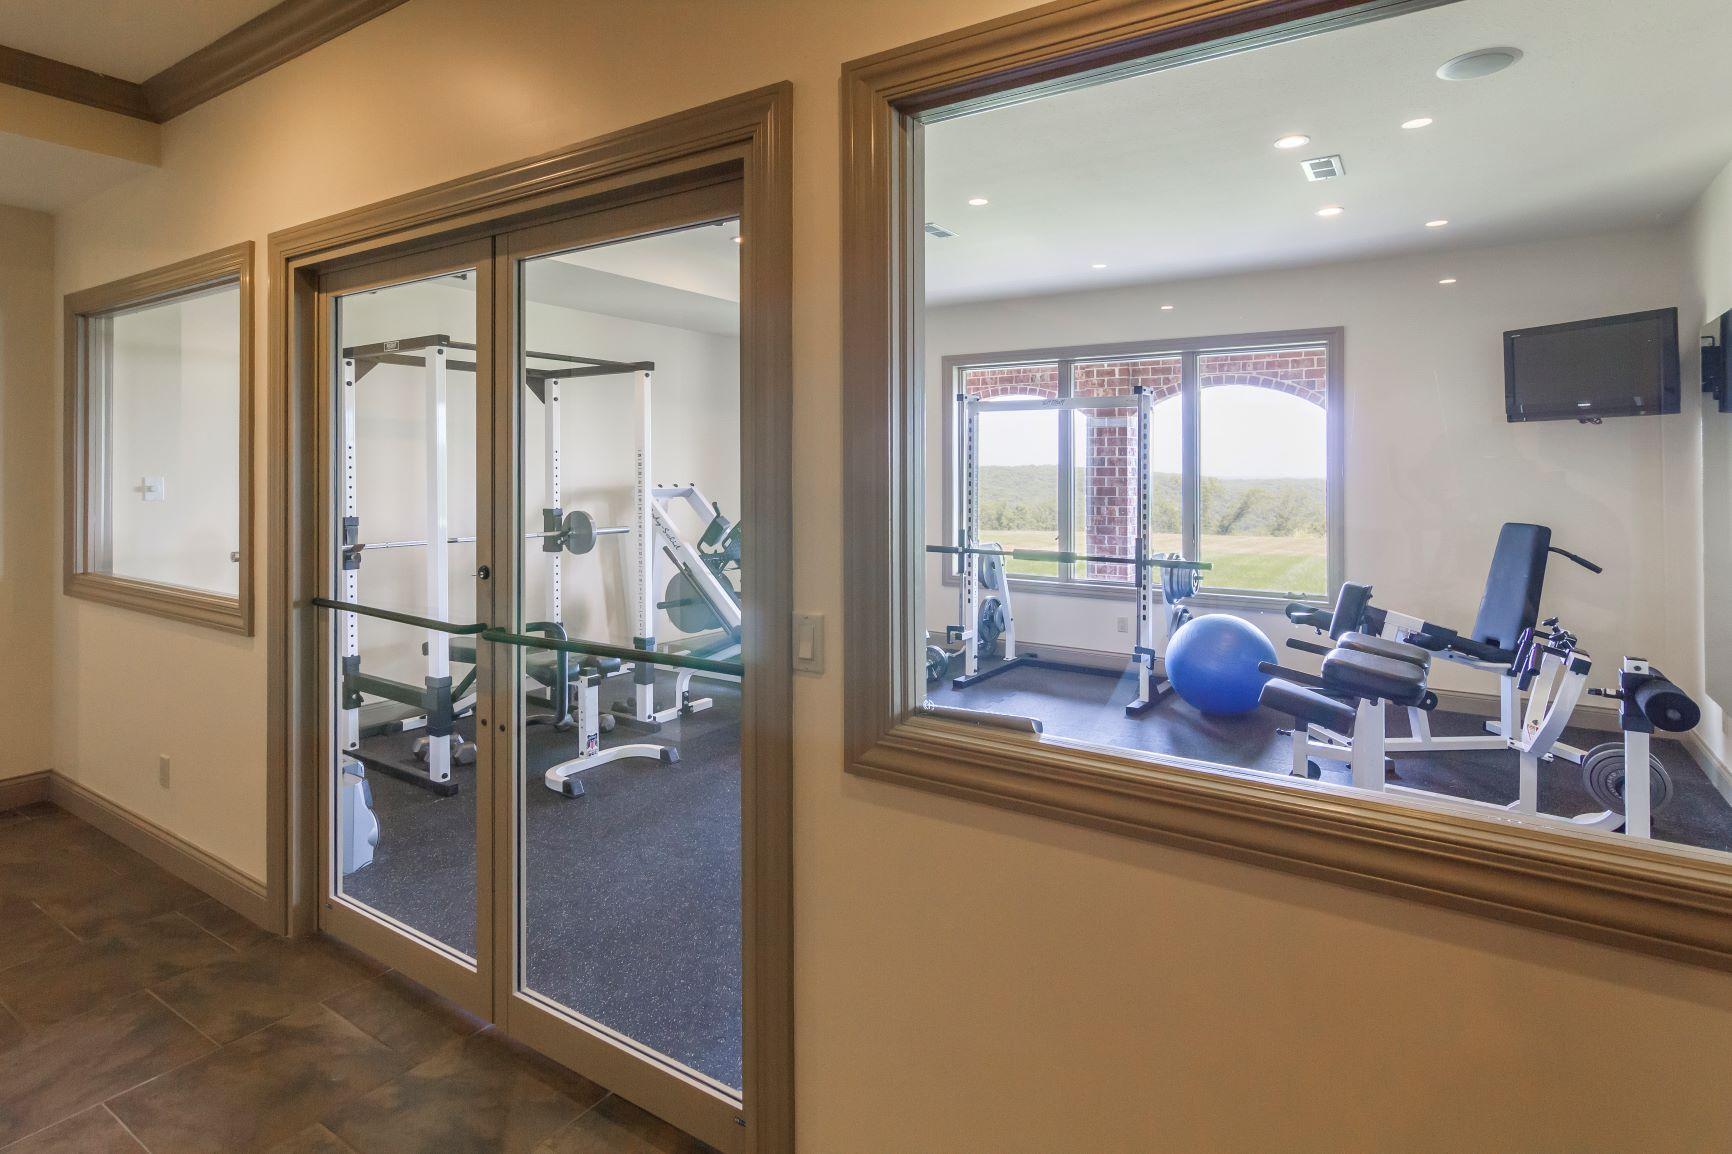 Southwoods weightroom1.jpg